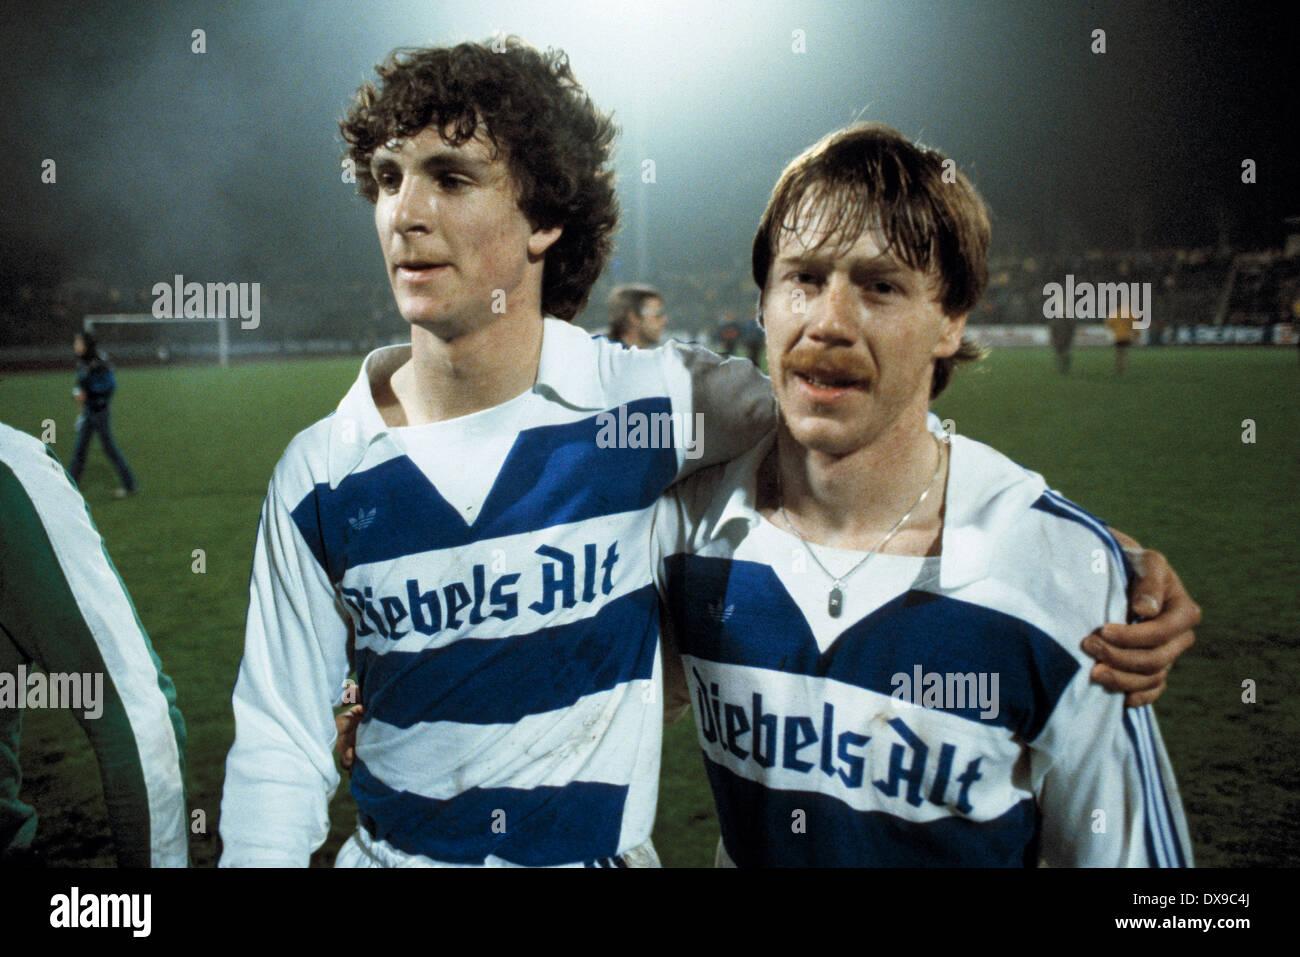 football, Bundesliga, 1979/1980, Wedau Stadium, MSV Duisburg versus SV Werder Bremen 4:1, end of the game, leaving, rejoicing at the win, Thomas Kempe (MSV) left and Gregor Grillemeier (MSV) - Stock Image